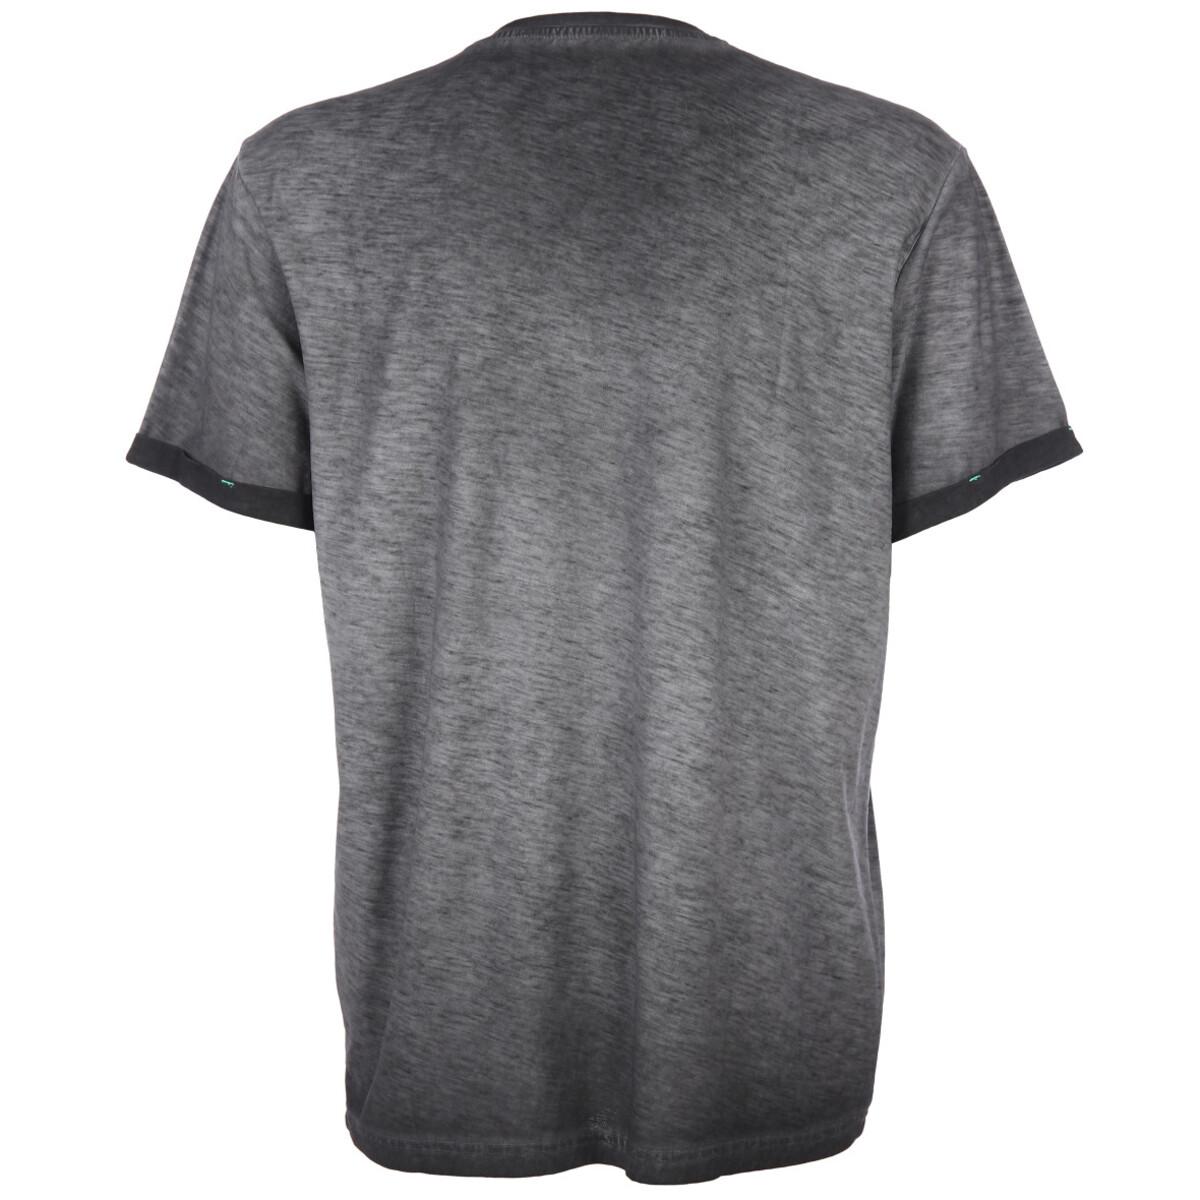 Bild 2 von Herren T-Shirt in melierter Optik